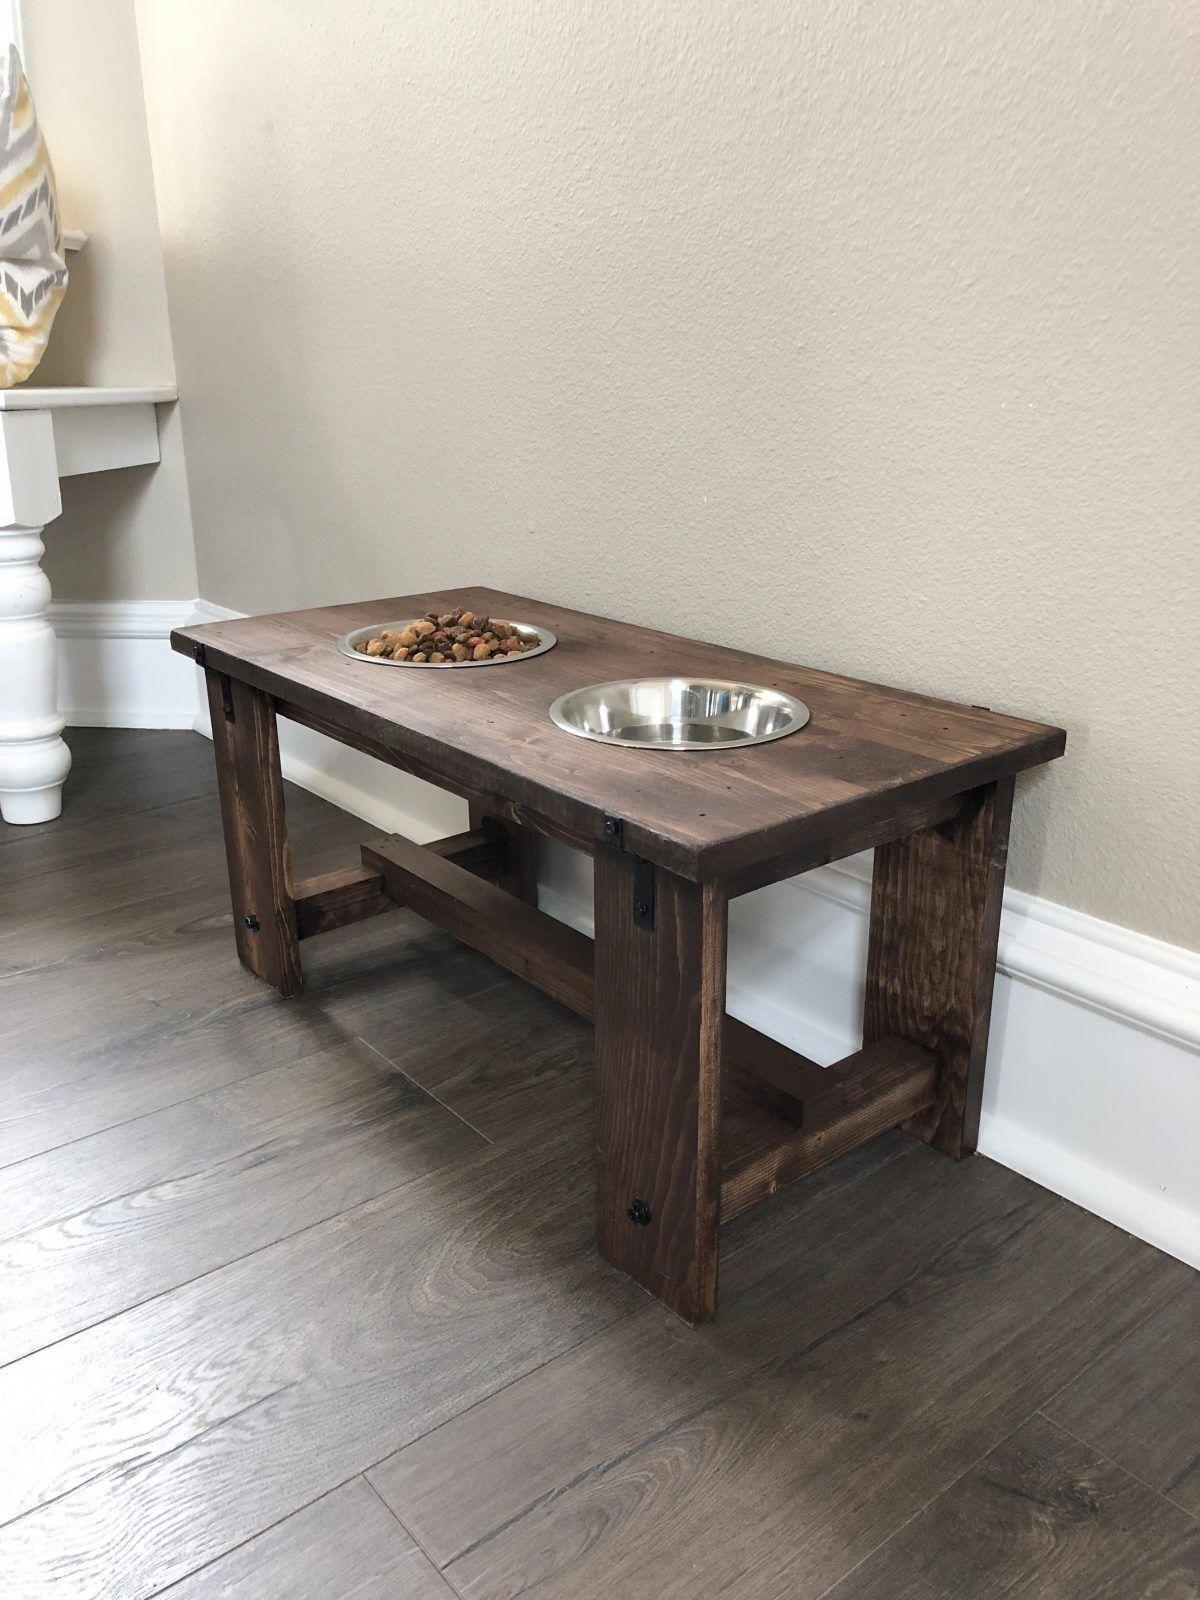 Diy dog bowl stand shanty 2 chic woodworkingdiypallet